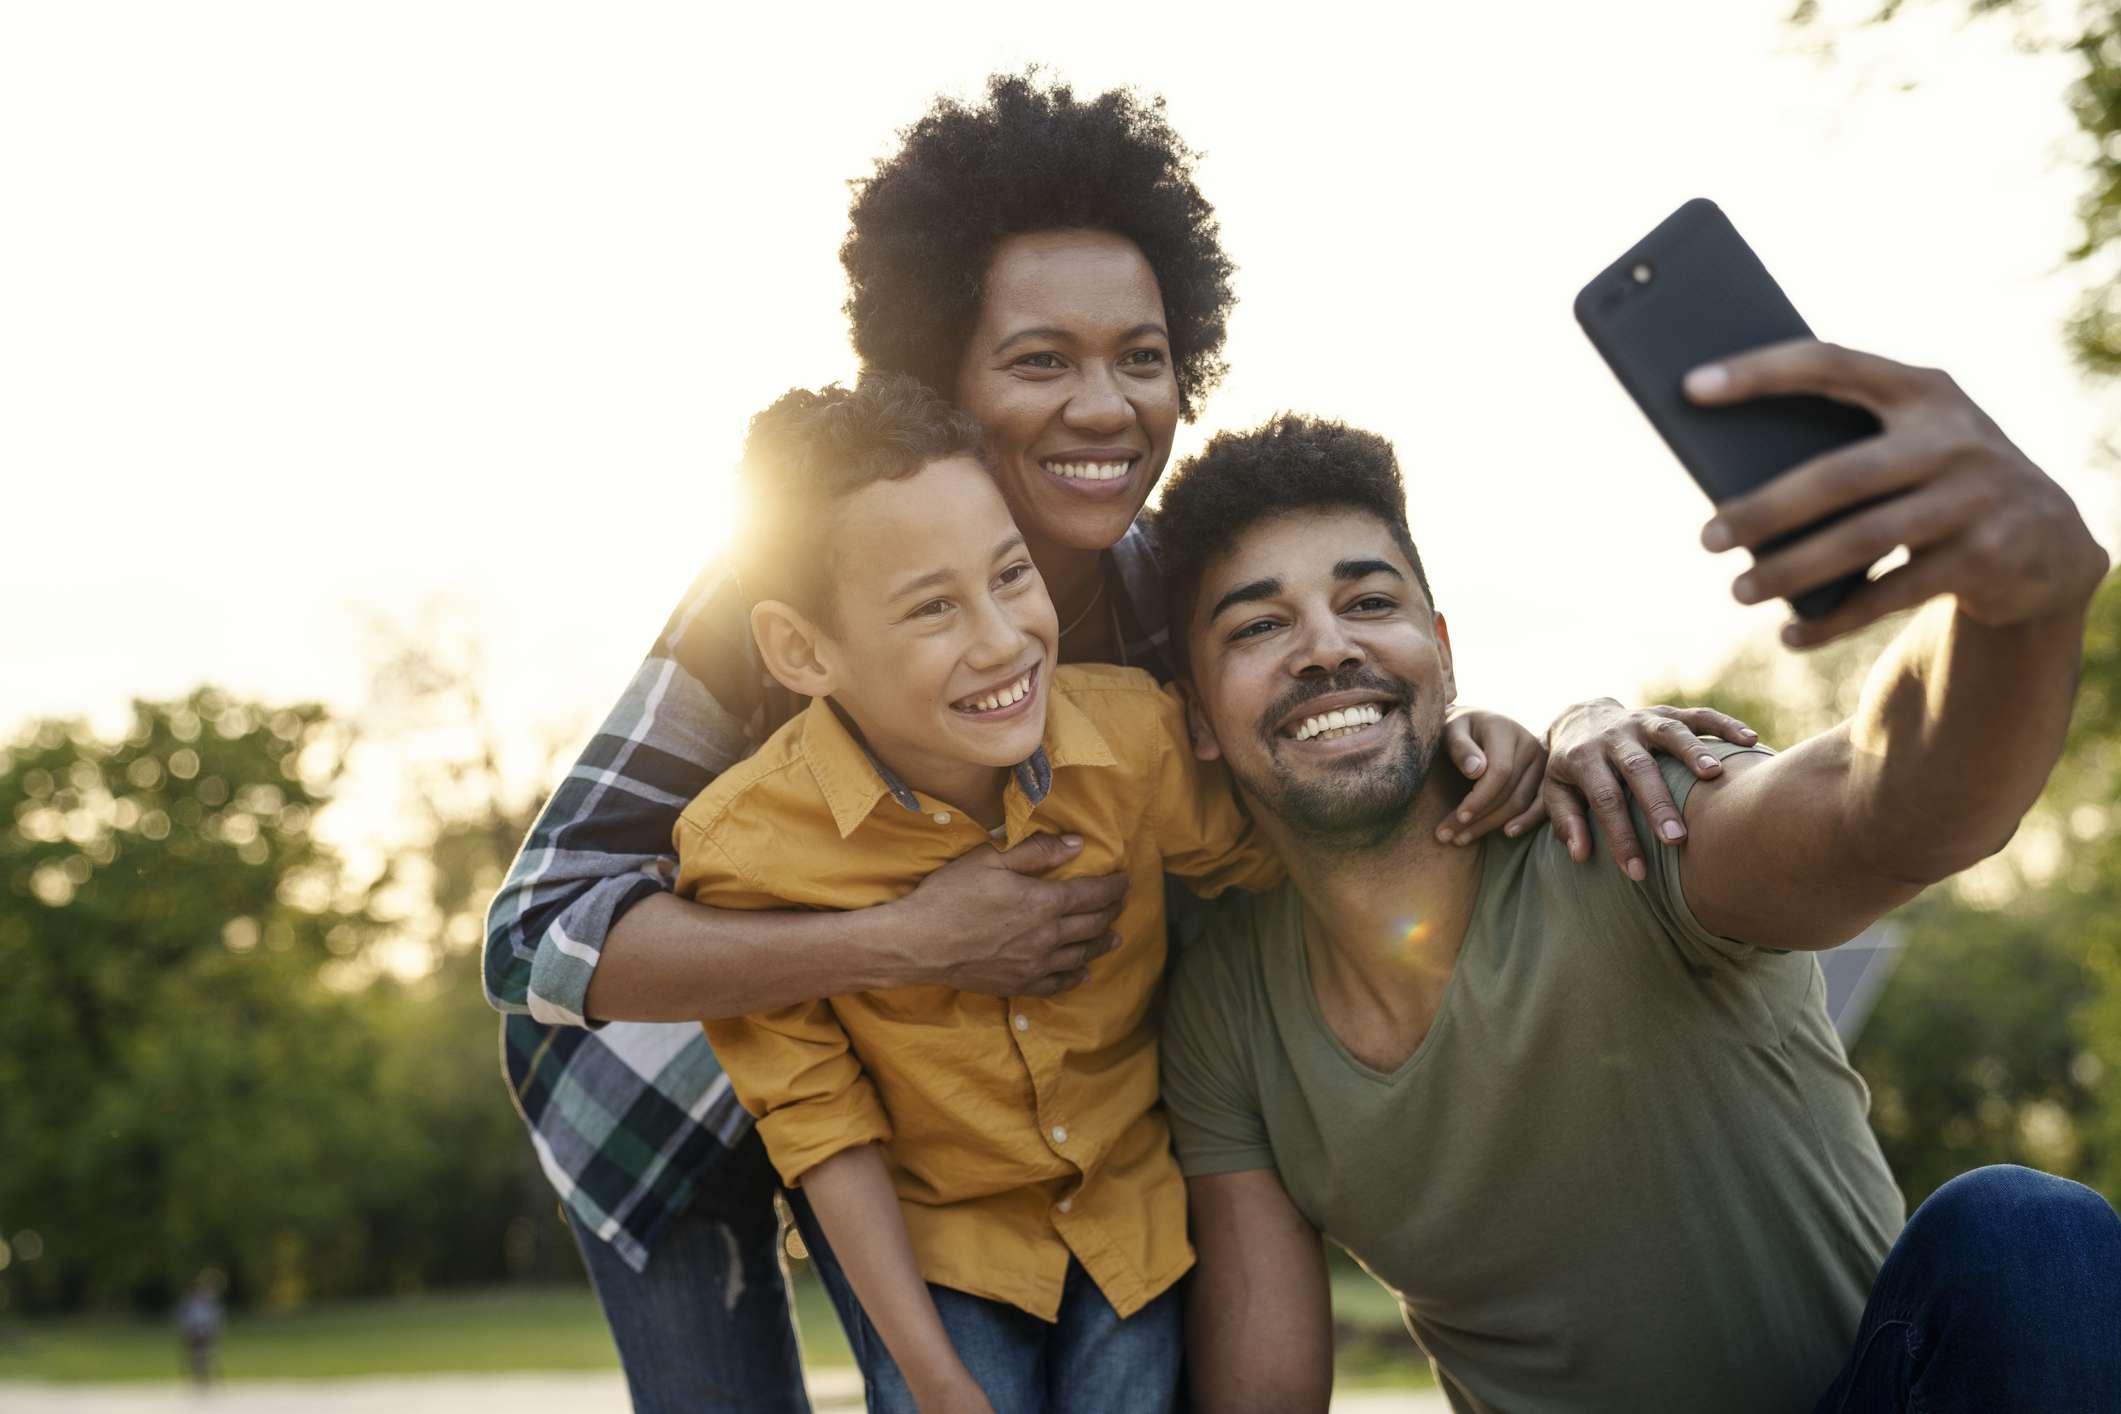 Familia joven se toma selfie en un entorno similar a un parque